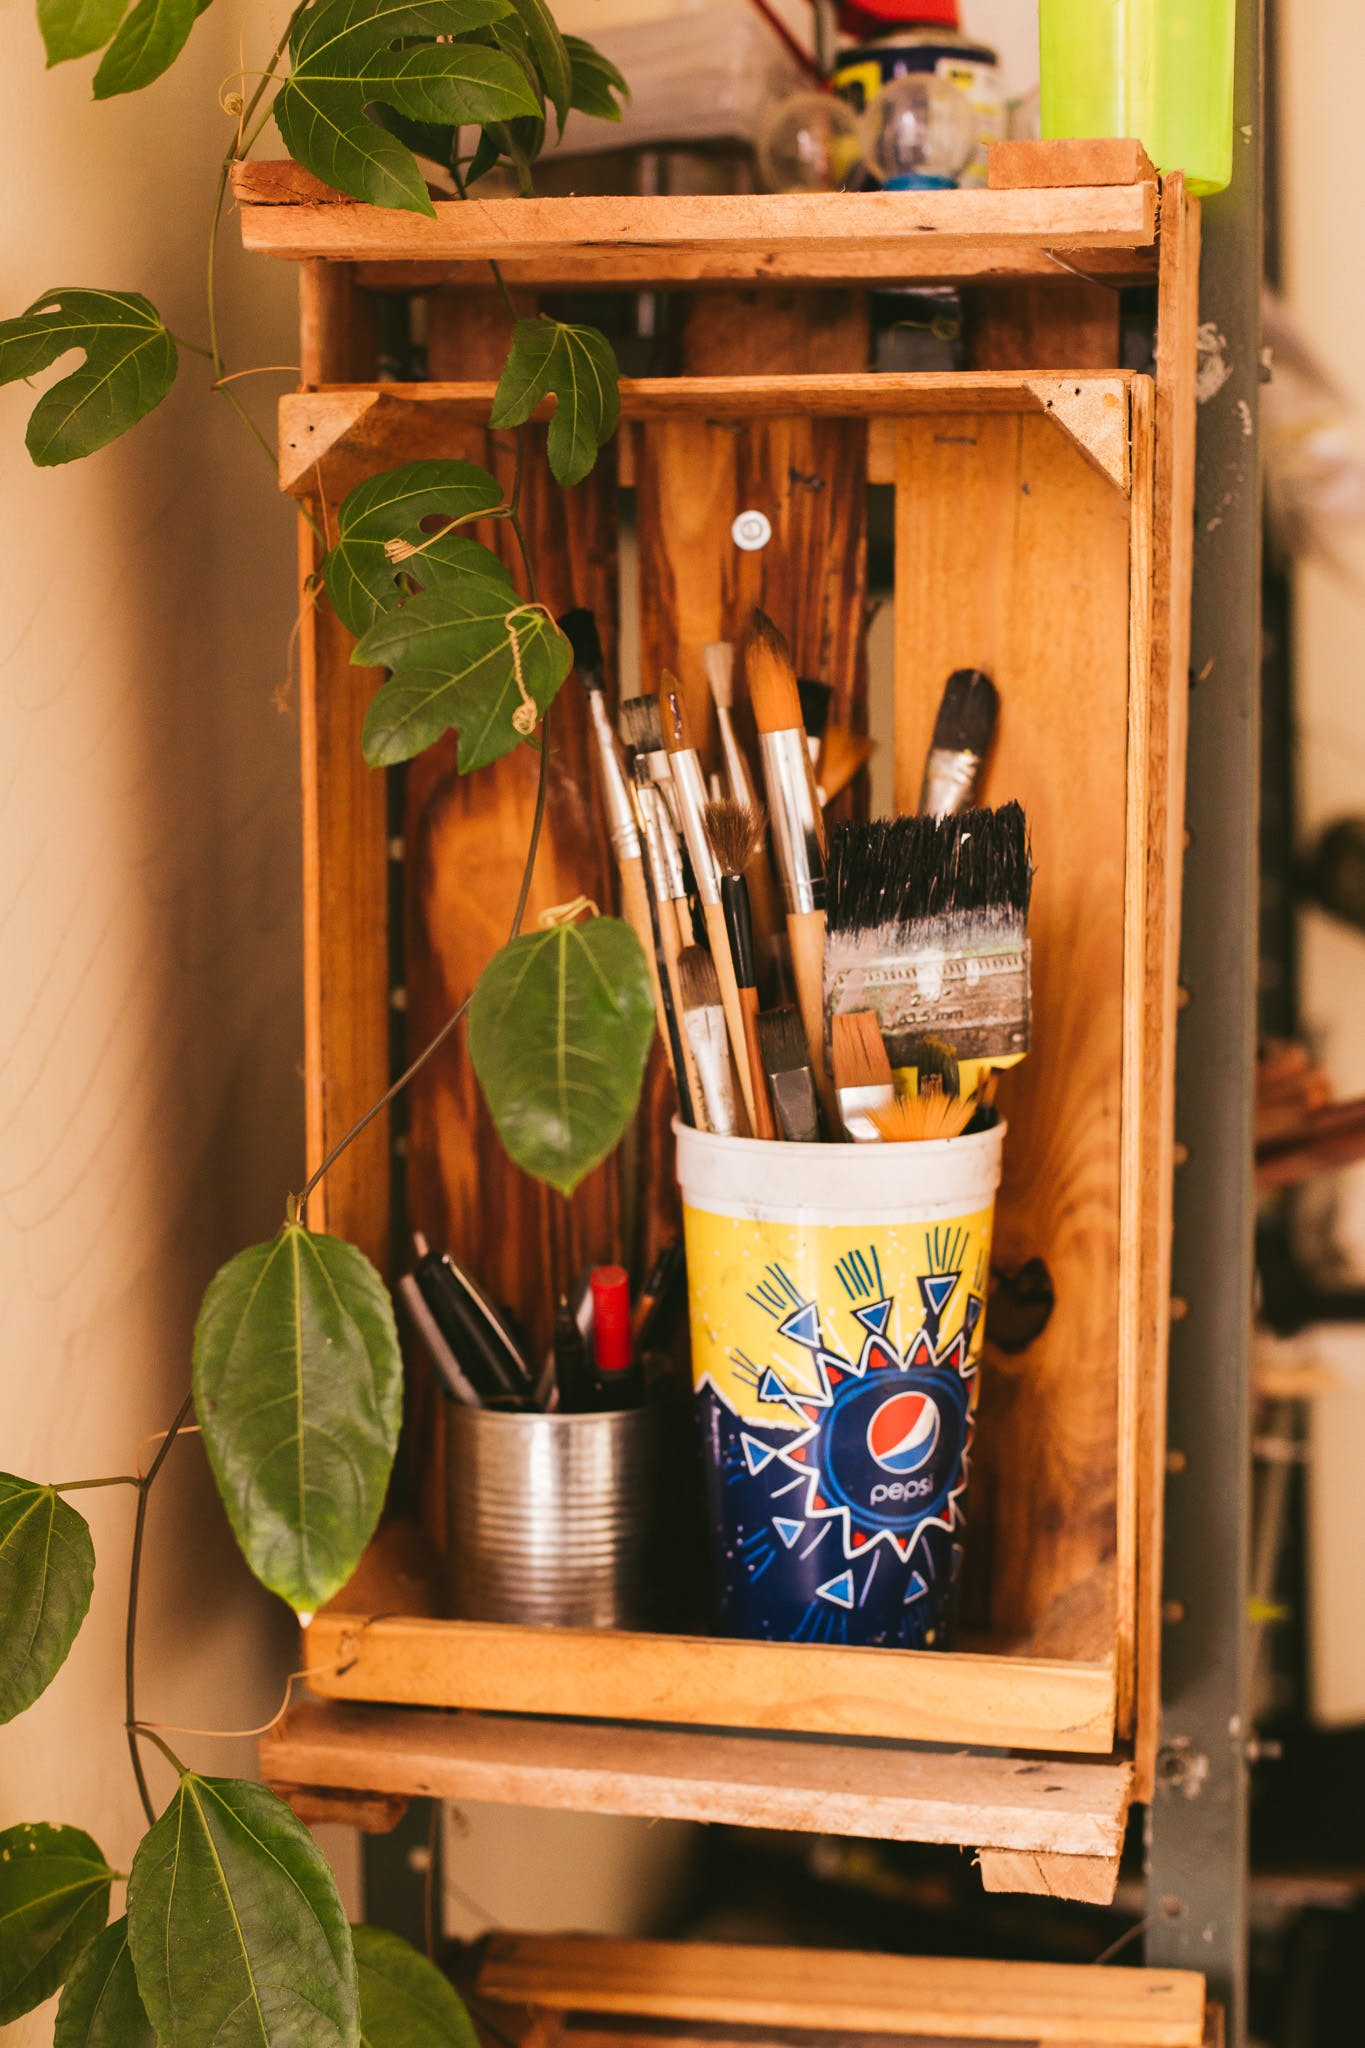 Paintbrush Set in White Container Inside Shelf